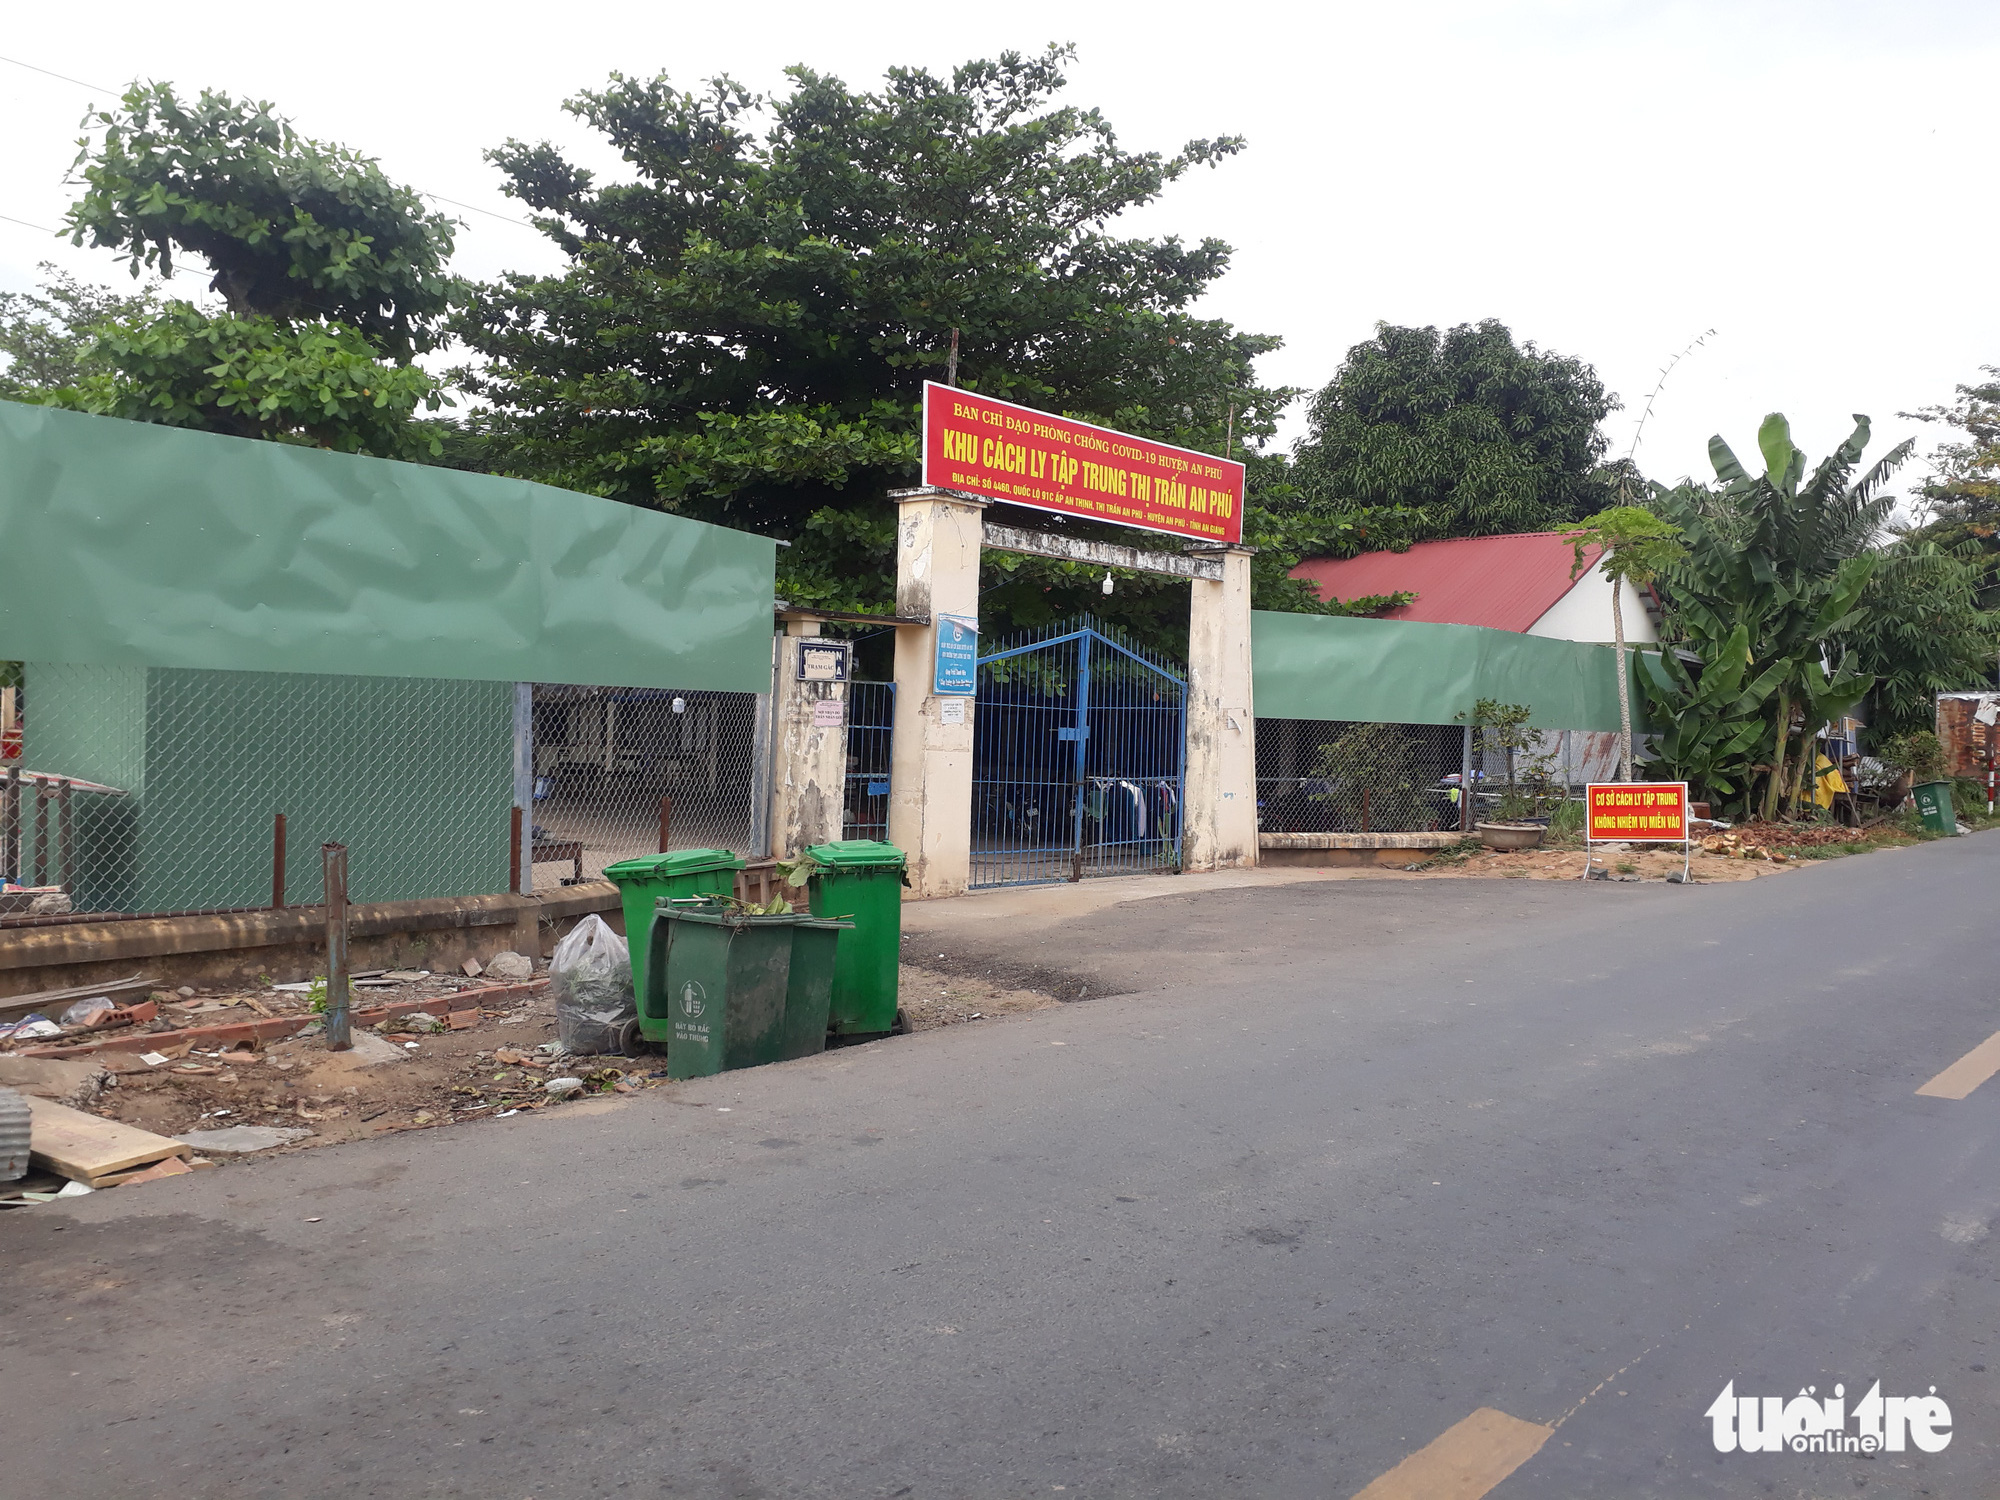 The quarantine facility in An Phu District, An Giang Province, Vietnam. Photo: Buu Dau / Tuoi Tre